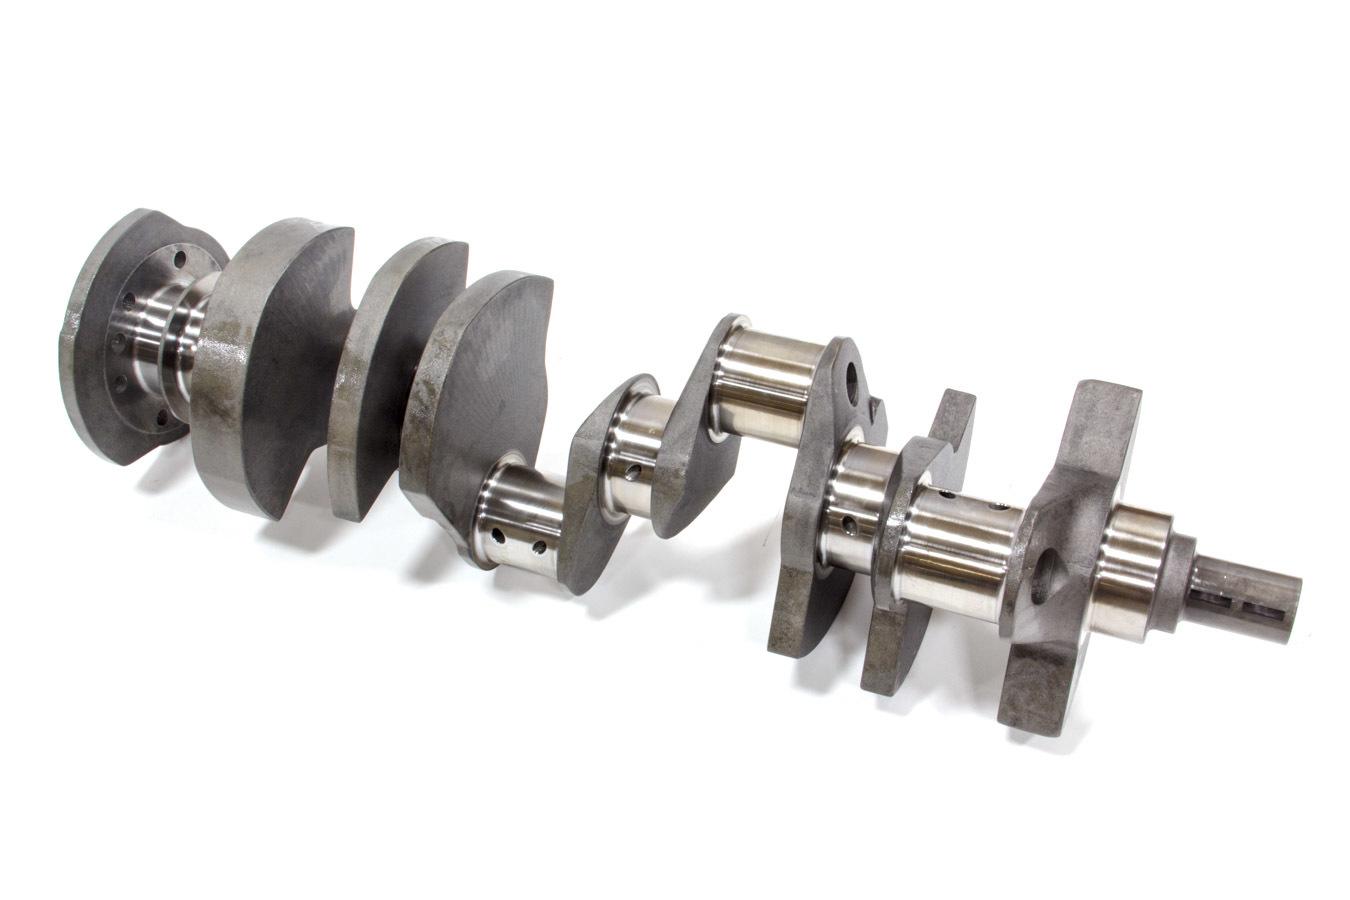 SBC 4340 Forged Crank 3.750 Stroke